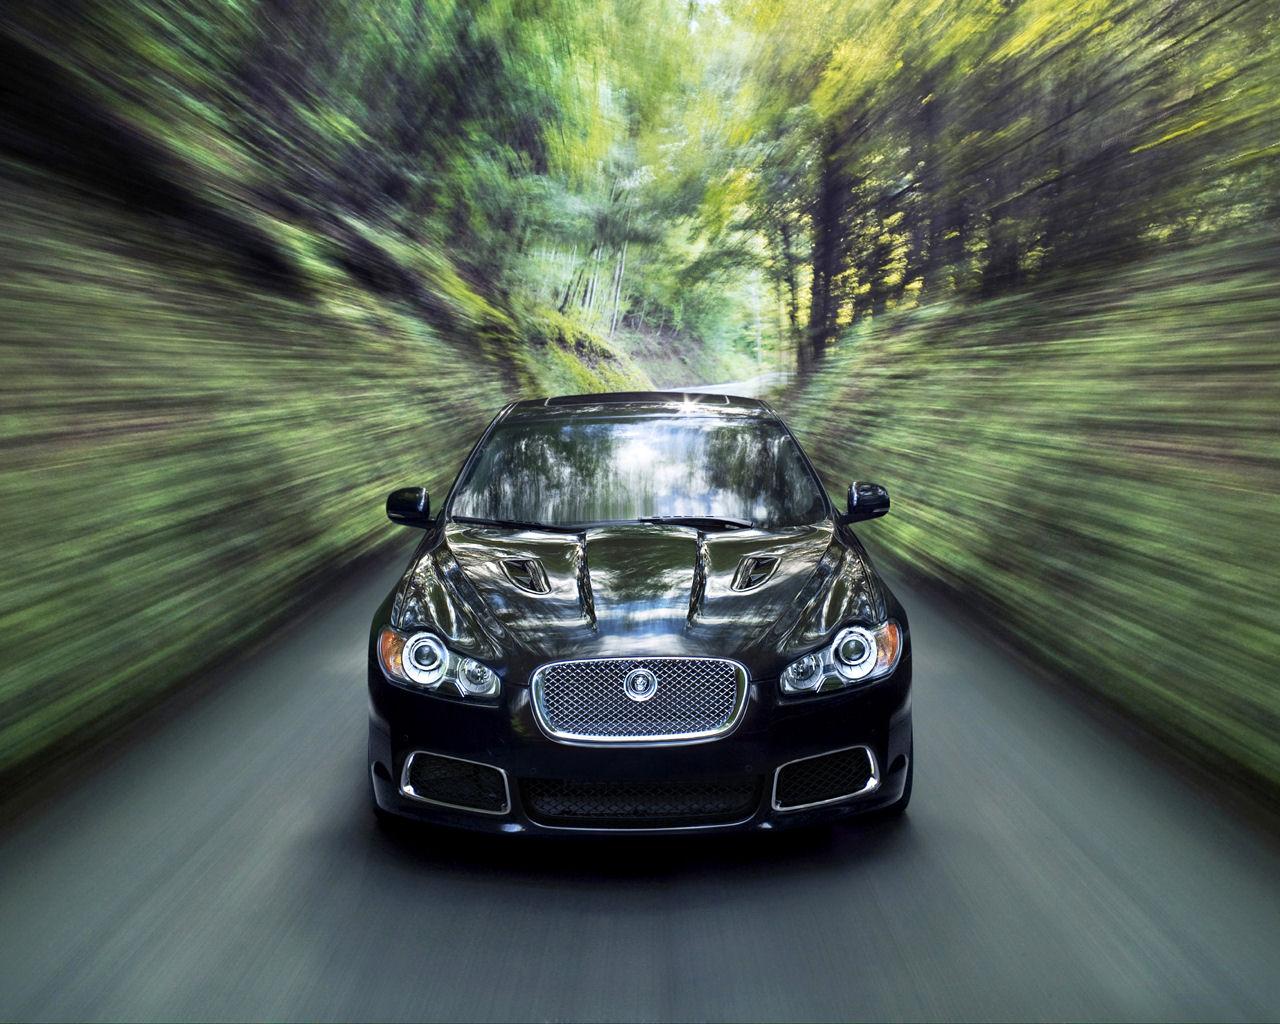 Jaguar XF 4.2, 5.0 Supercharged, XFR - Free 1280x1024 Wallpaper ...